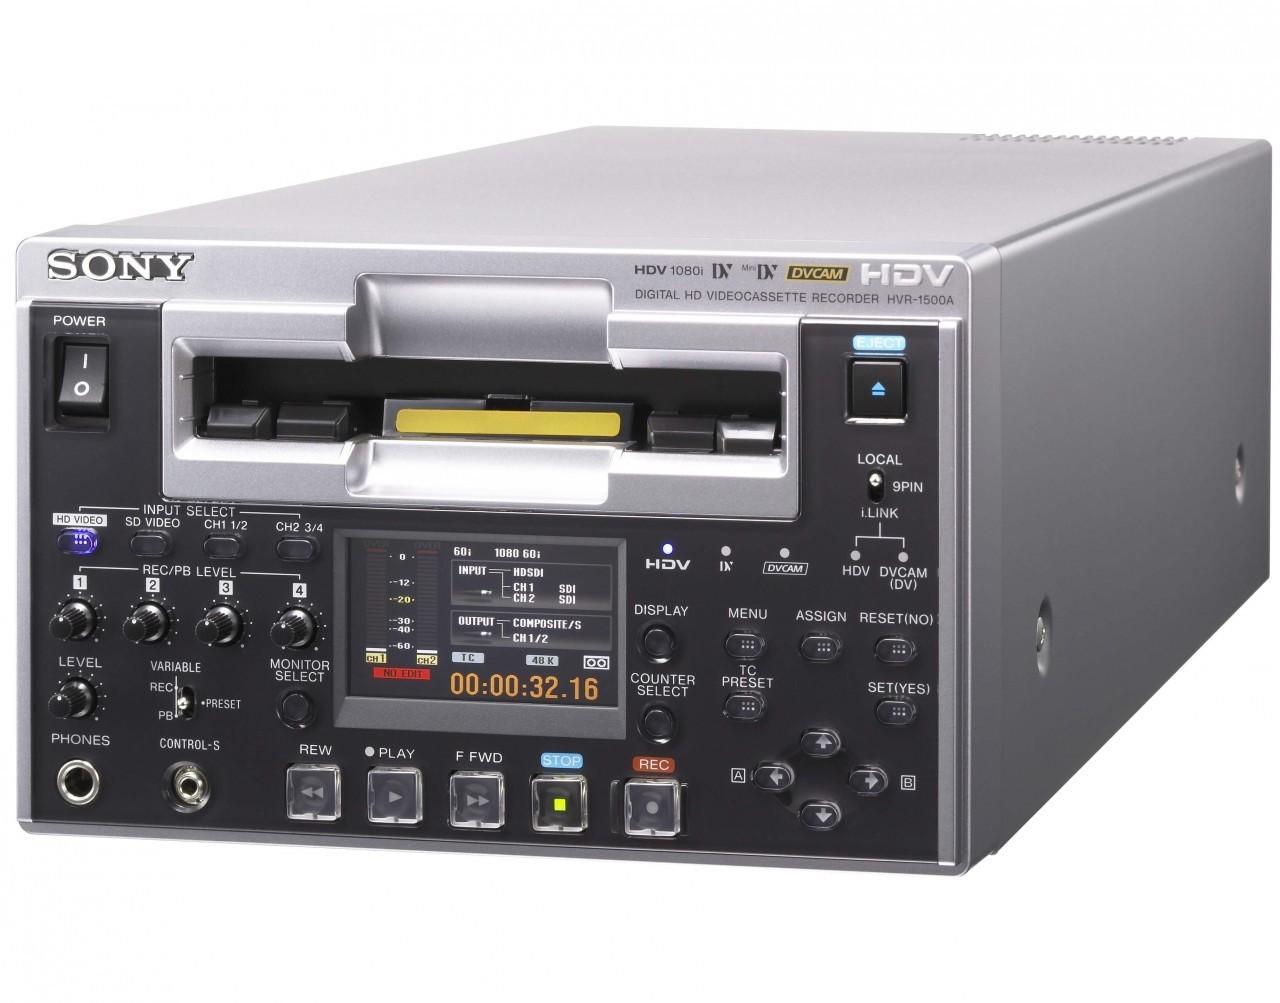 Sony HVR-1500A HDV VTR